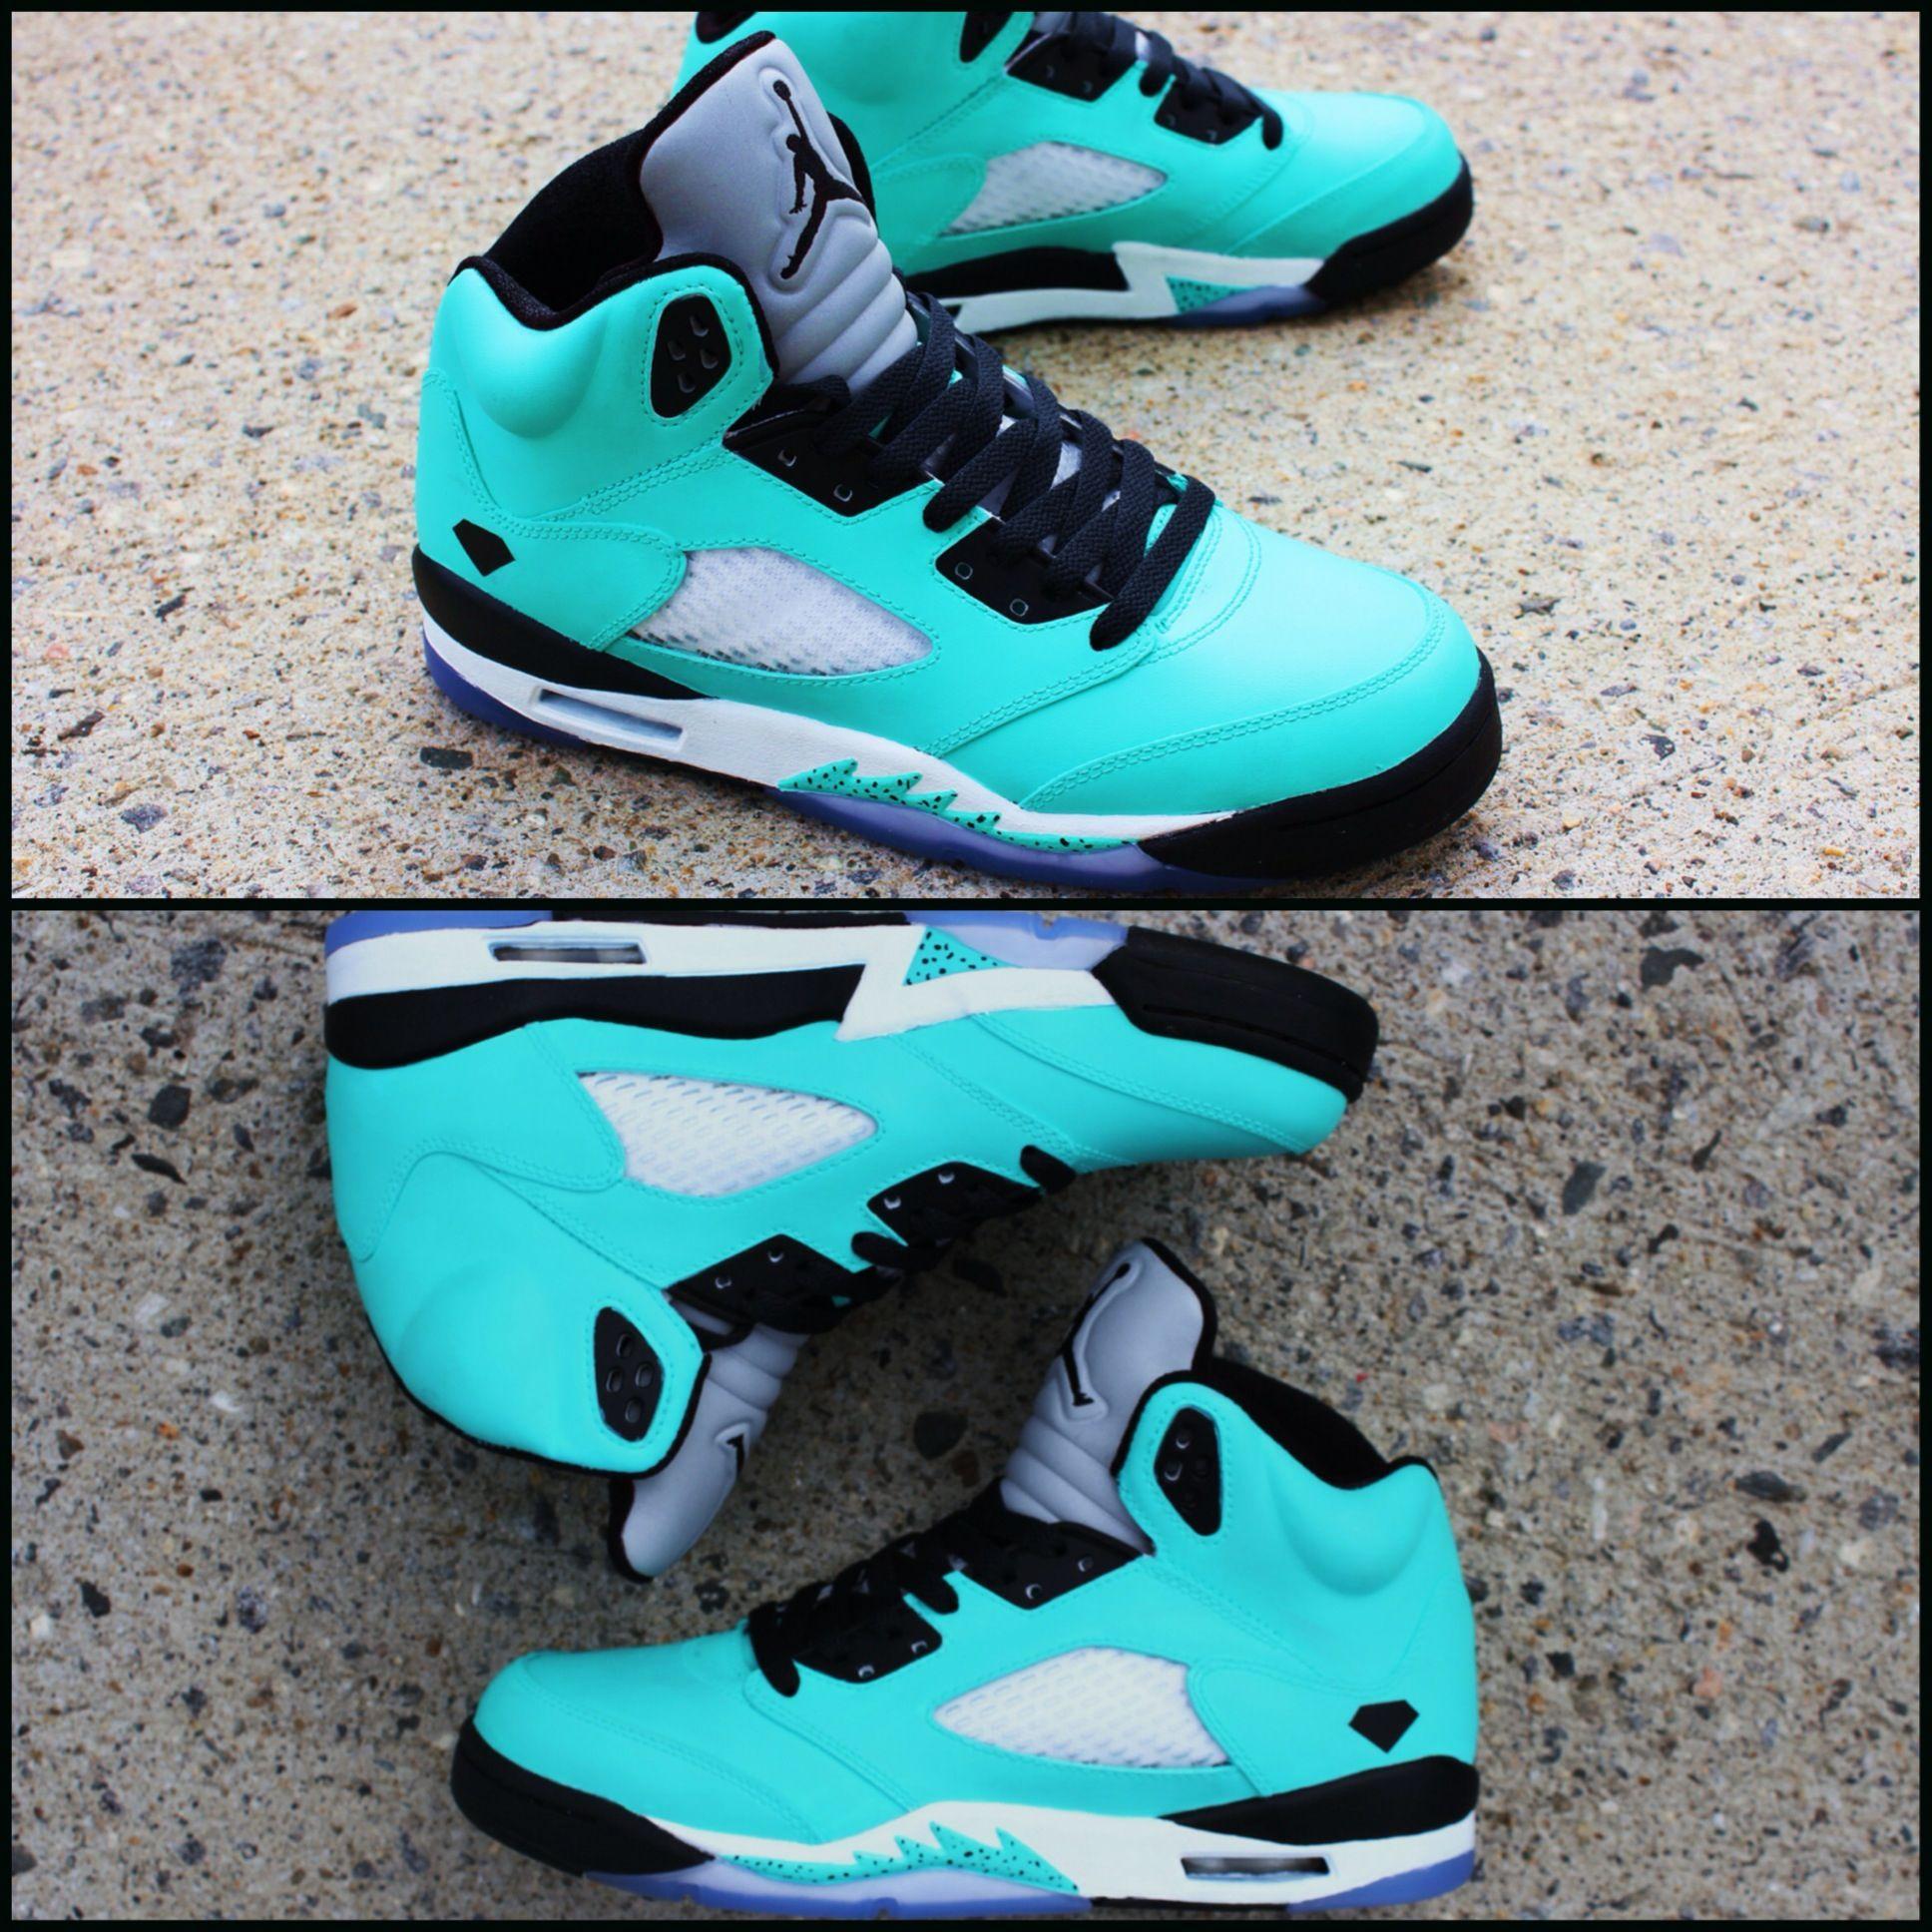 sale retailer 32dbe 03b5e New Cheap Nike Air Jordan 11 Low Black Tiffany Custom ...